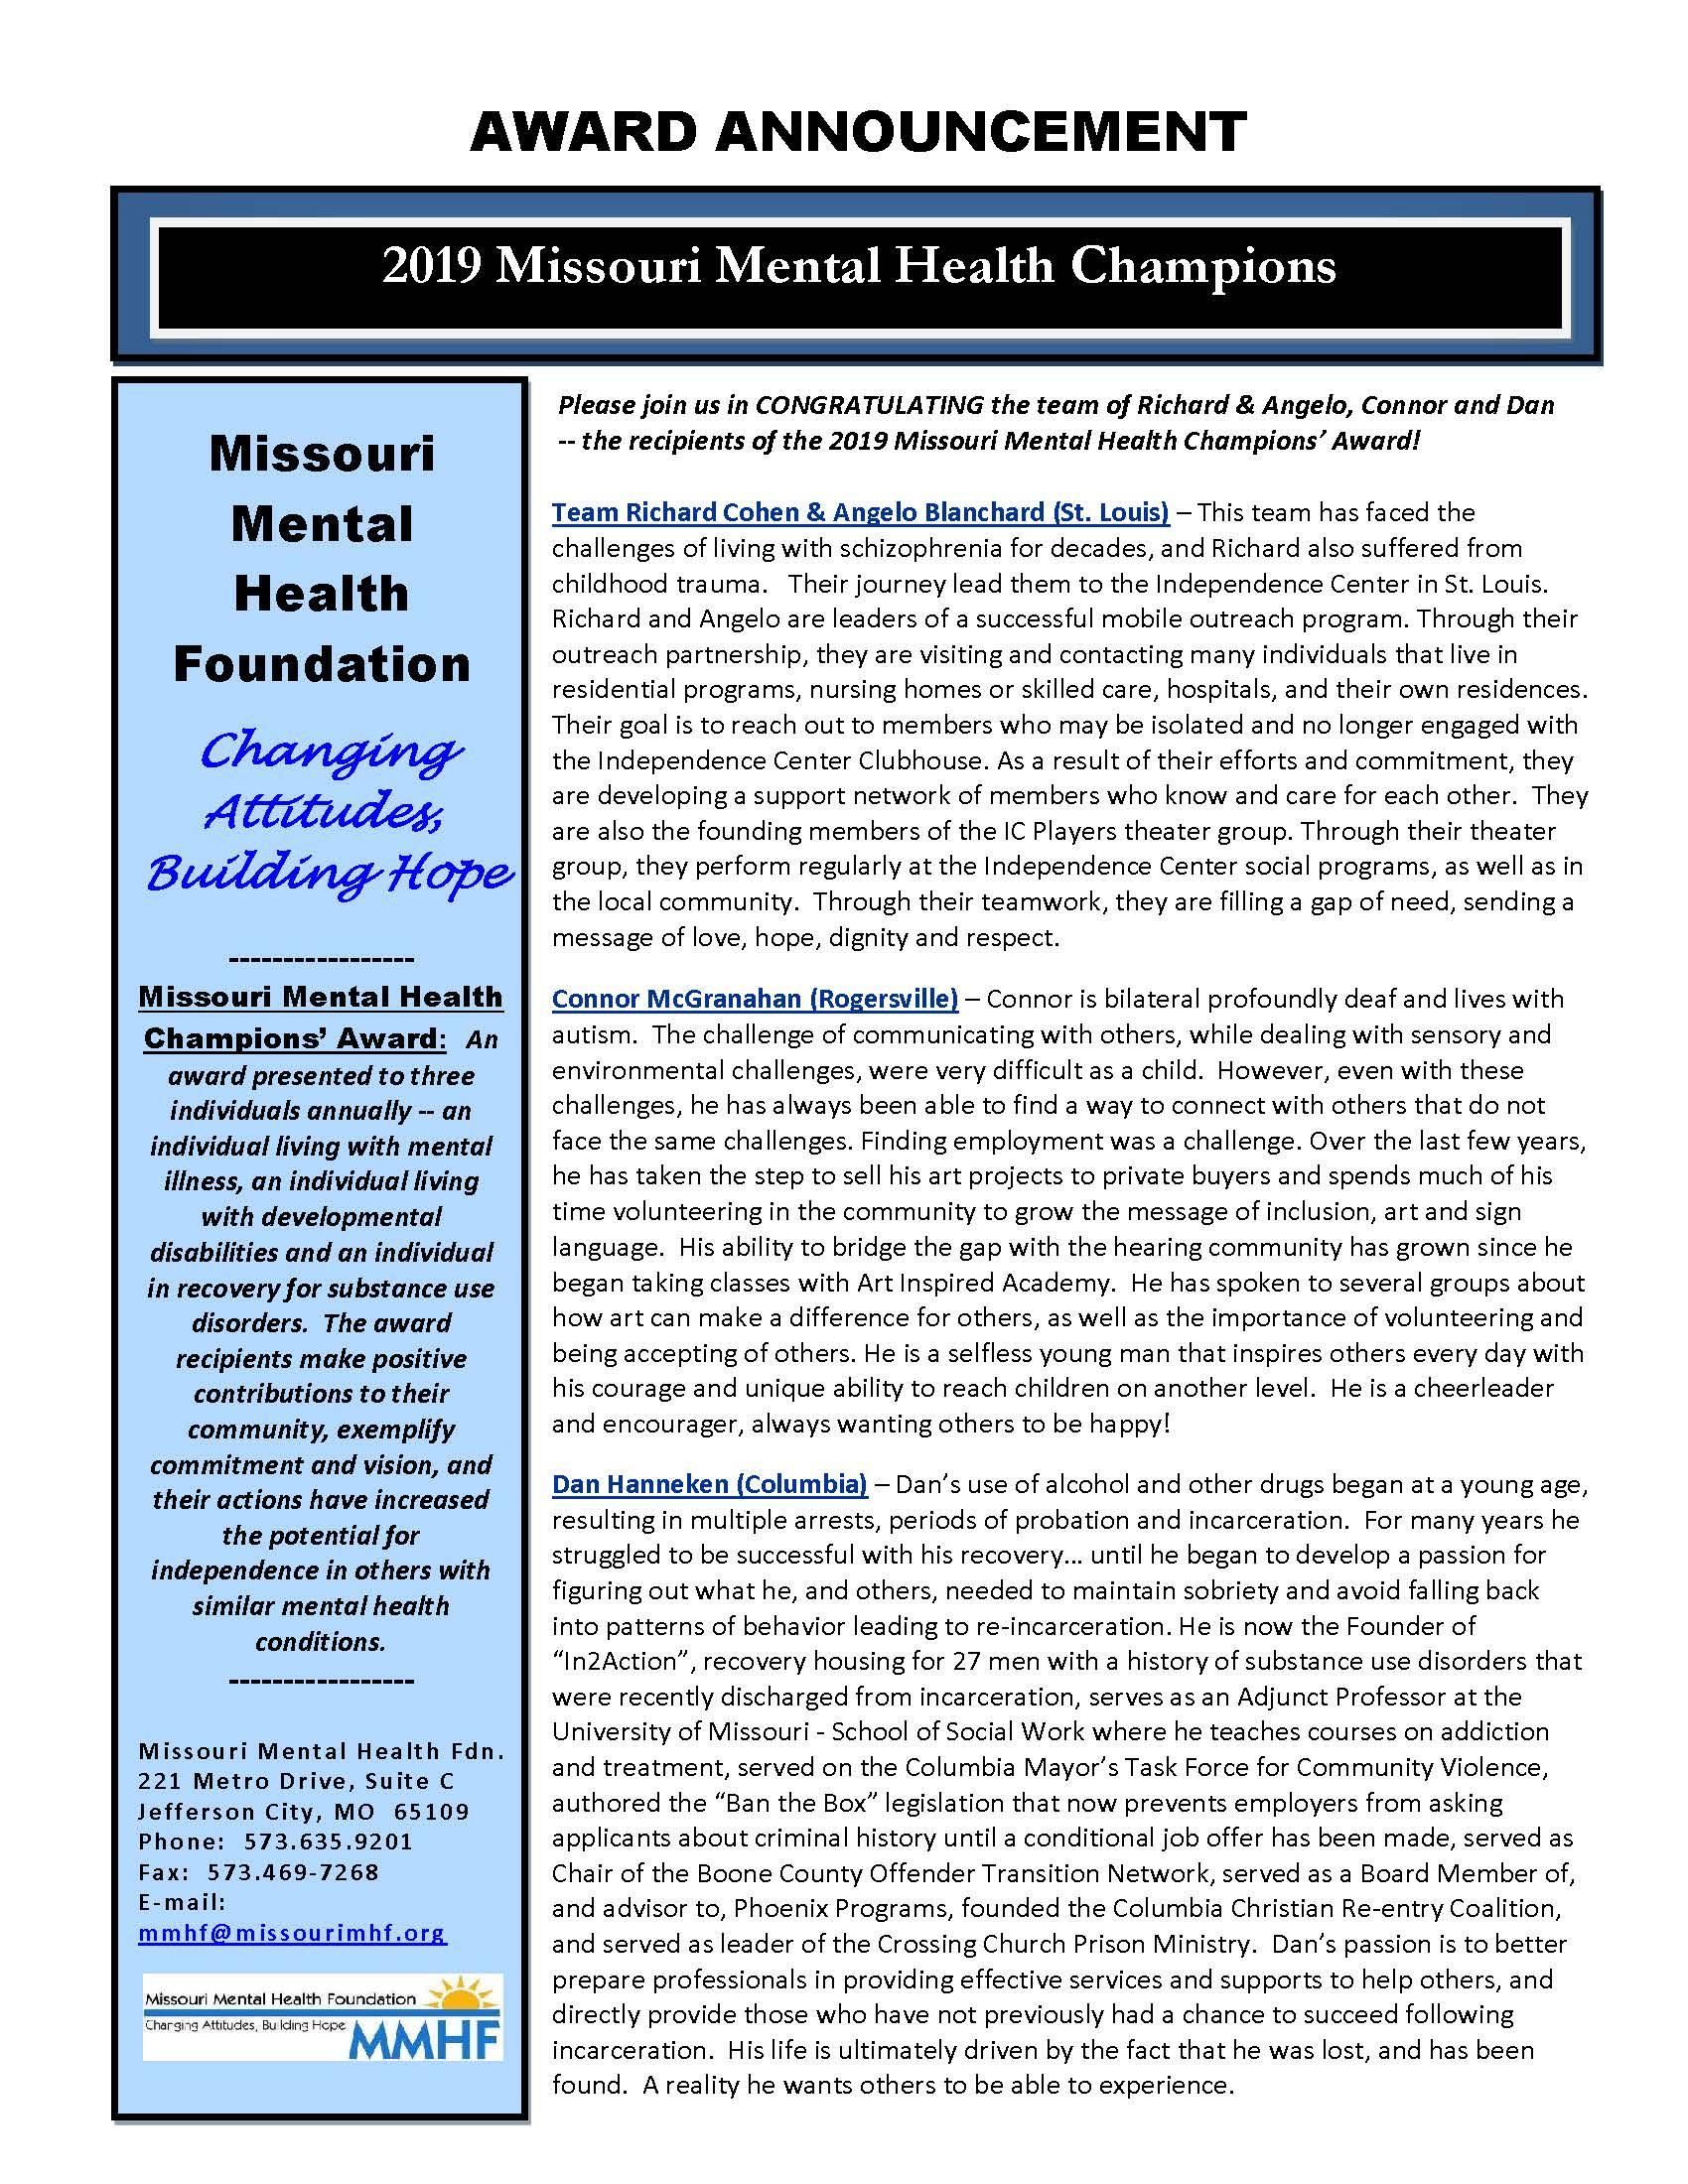 2019 Mental Health Champions' Awards Banquet | Missouri